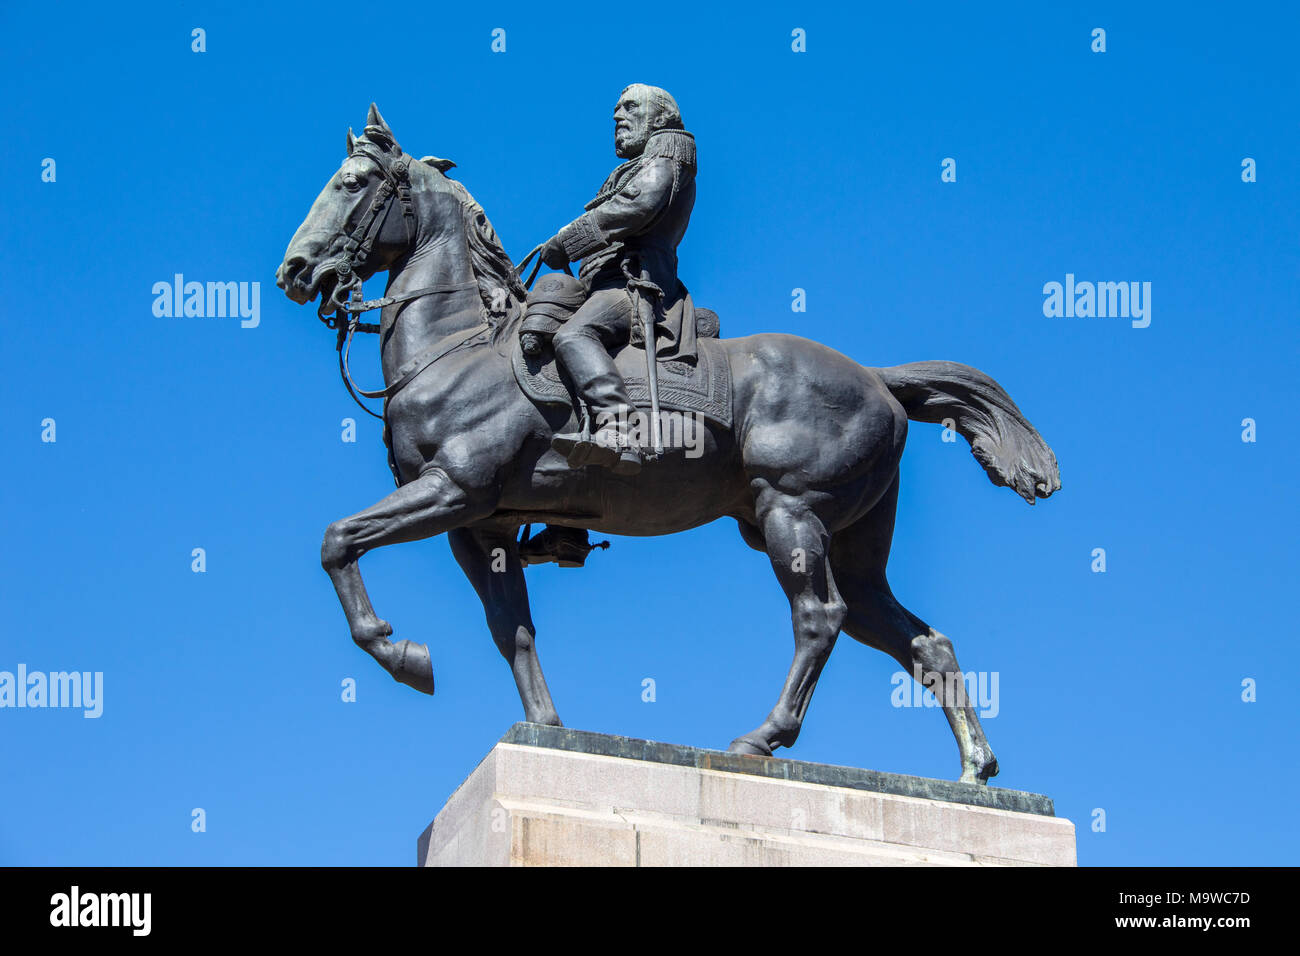 General José de San Martin, Plaza San Martin, Retiro, Buenos Aires, Argentina - Stock Image